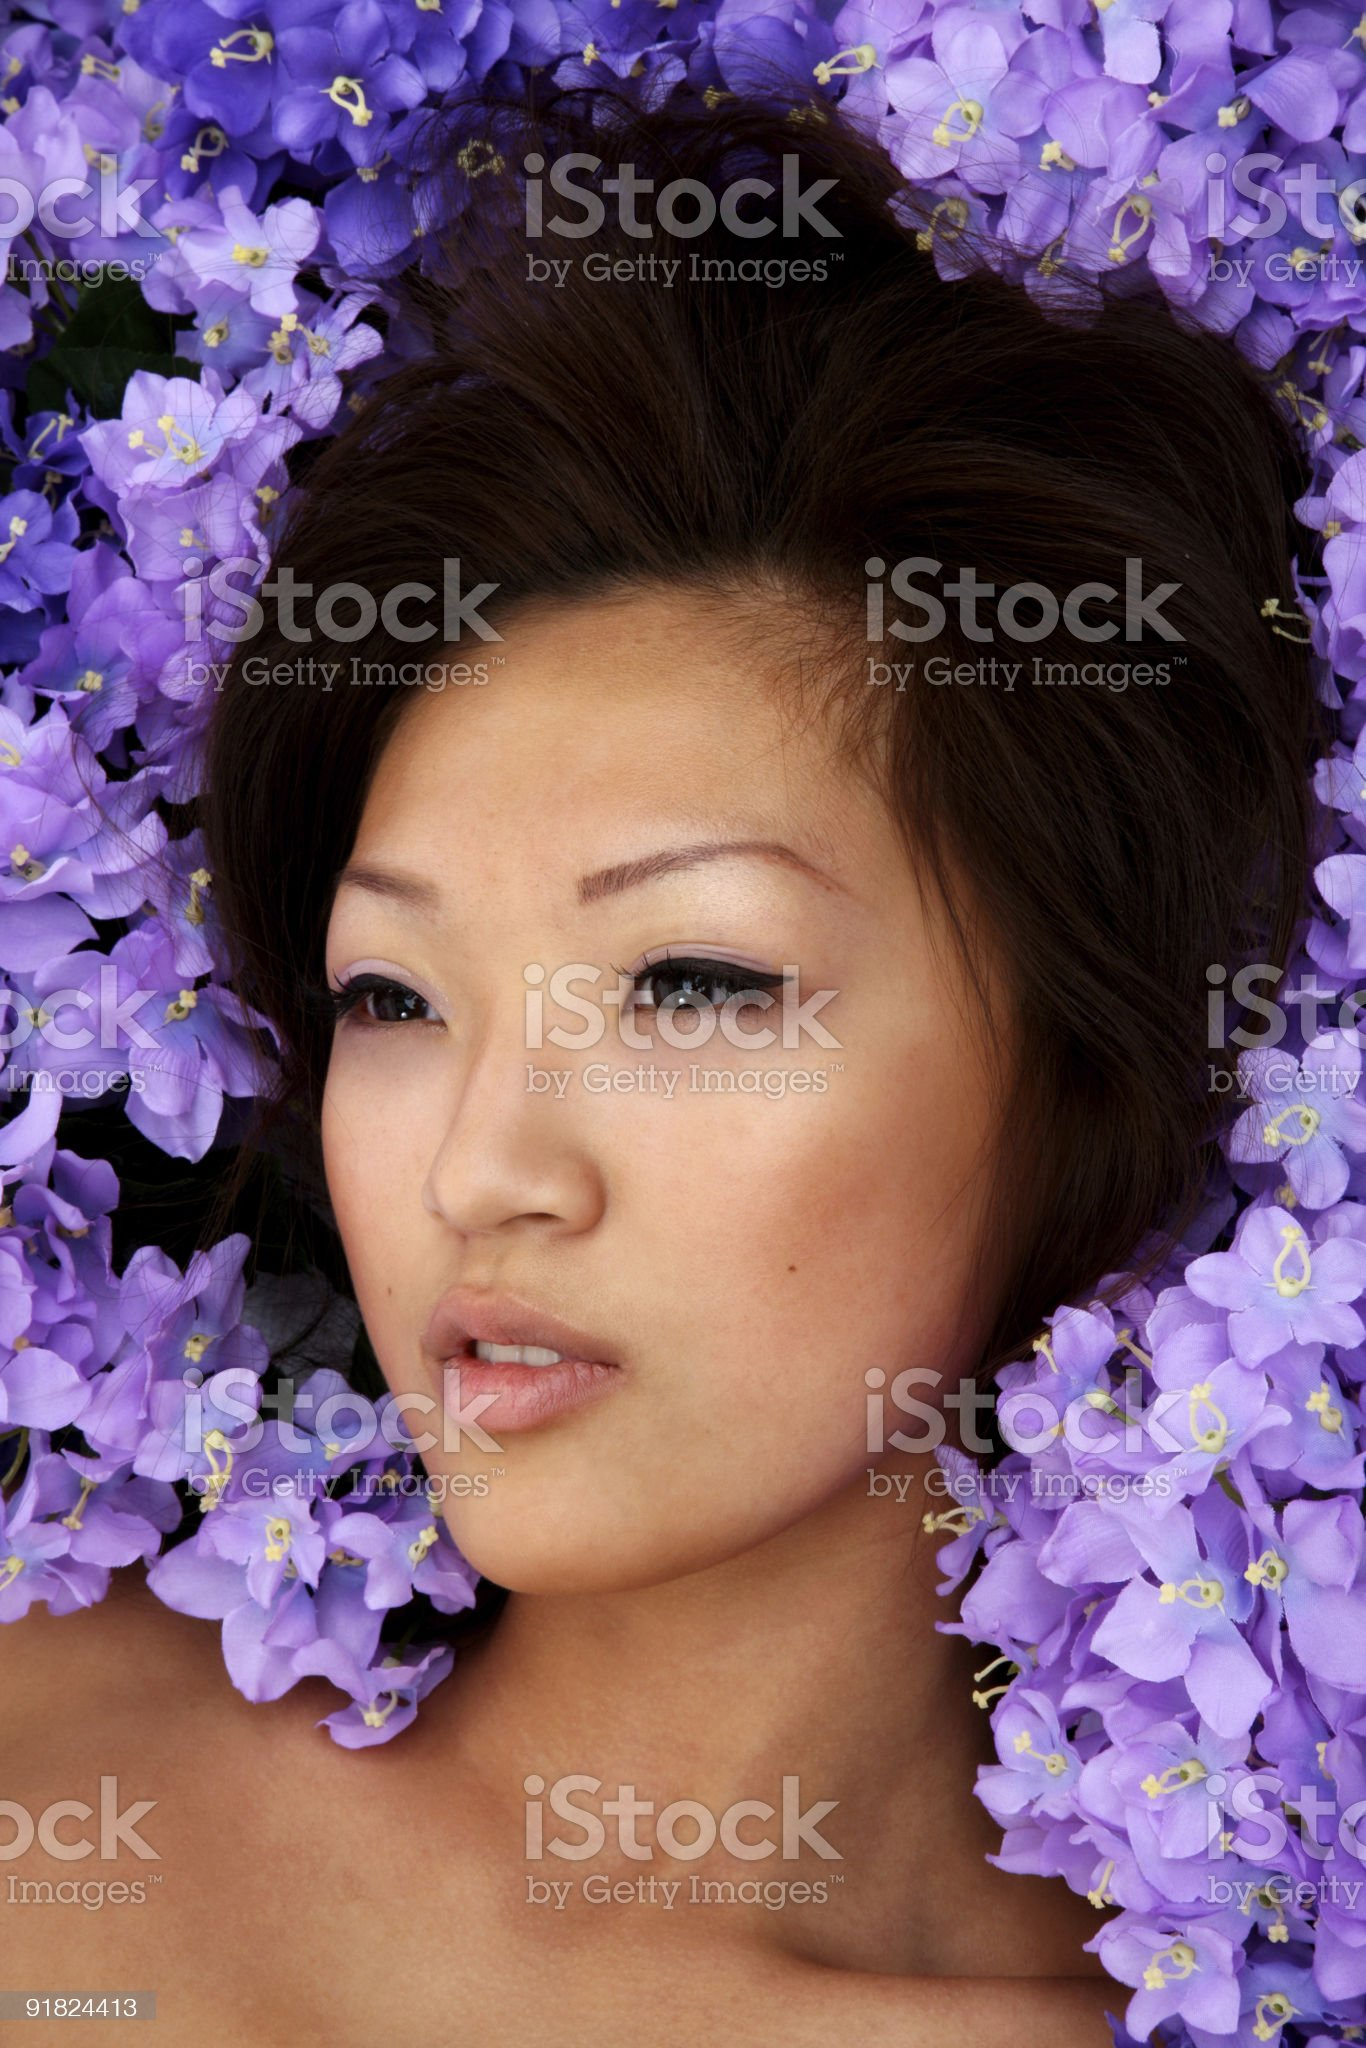 Beautiful Asian woman headshot laying in flowers royalty-free stock photo